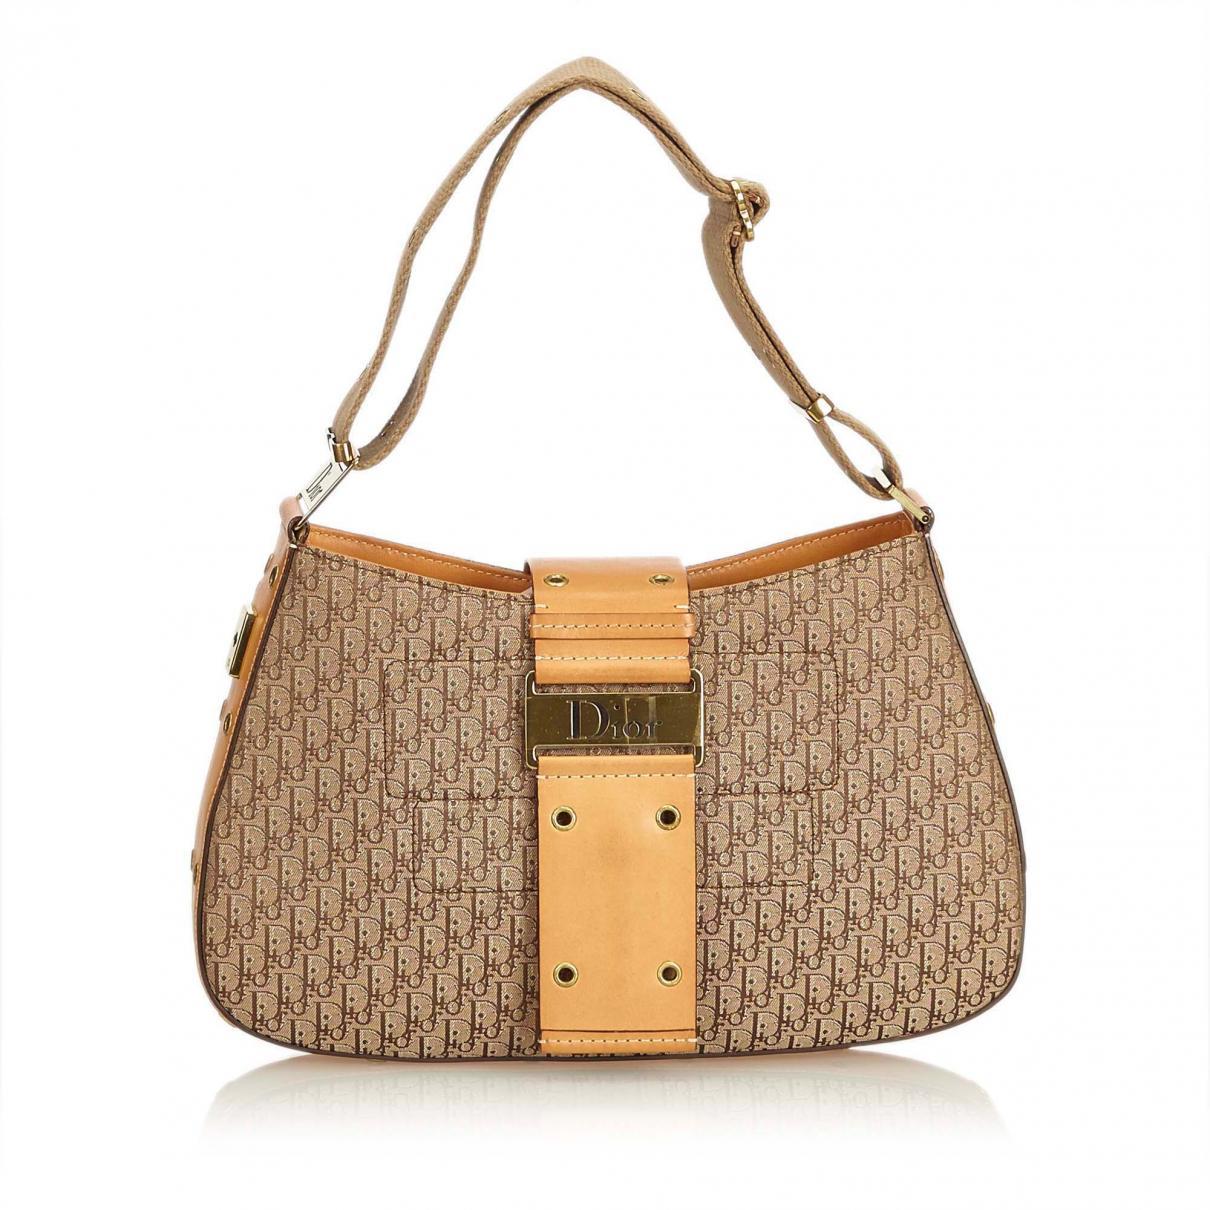 a9adf07cf87 Lyst - Dior Pre-owned Brown Cloth Handbags in Brown